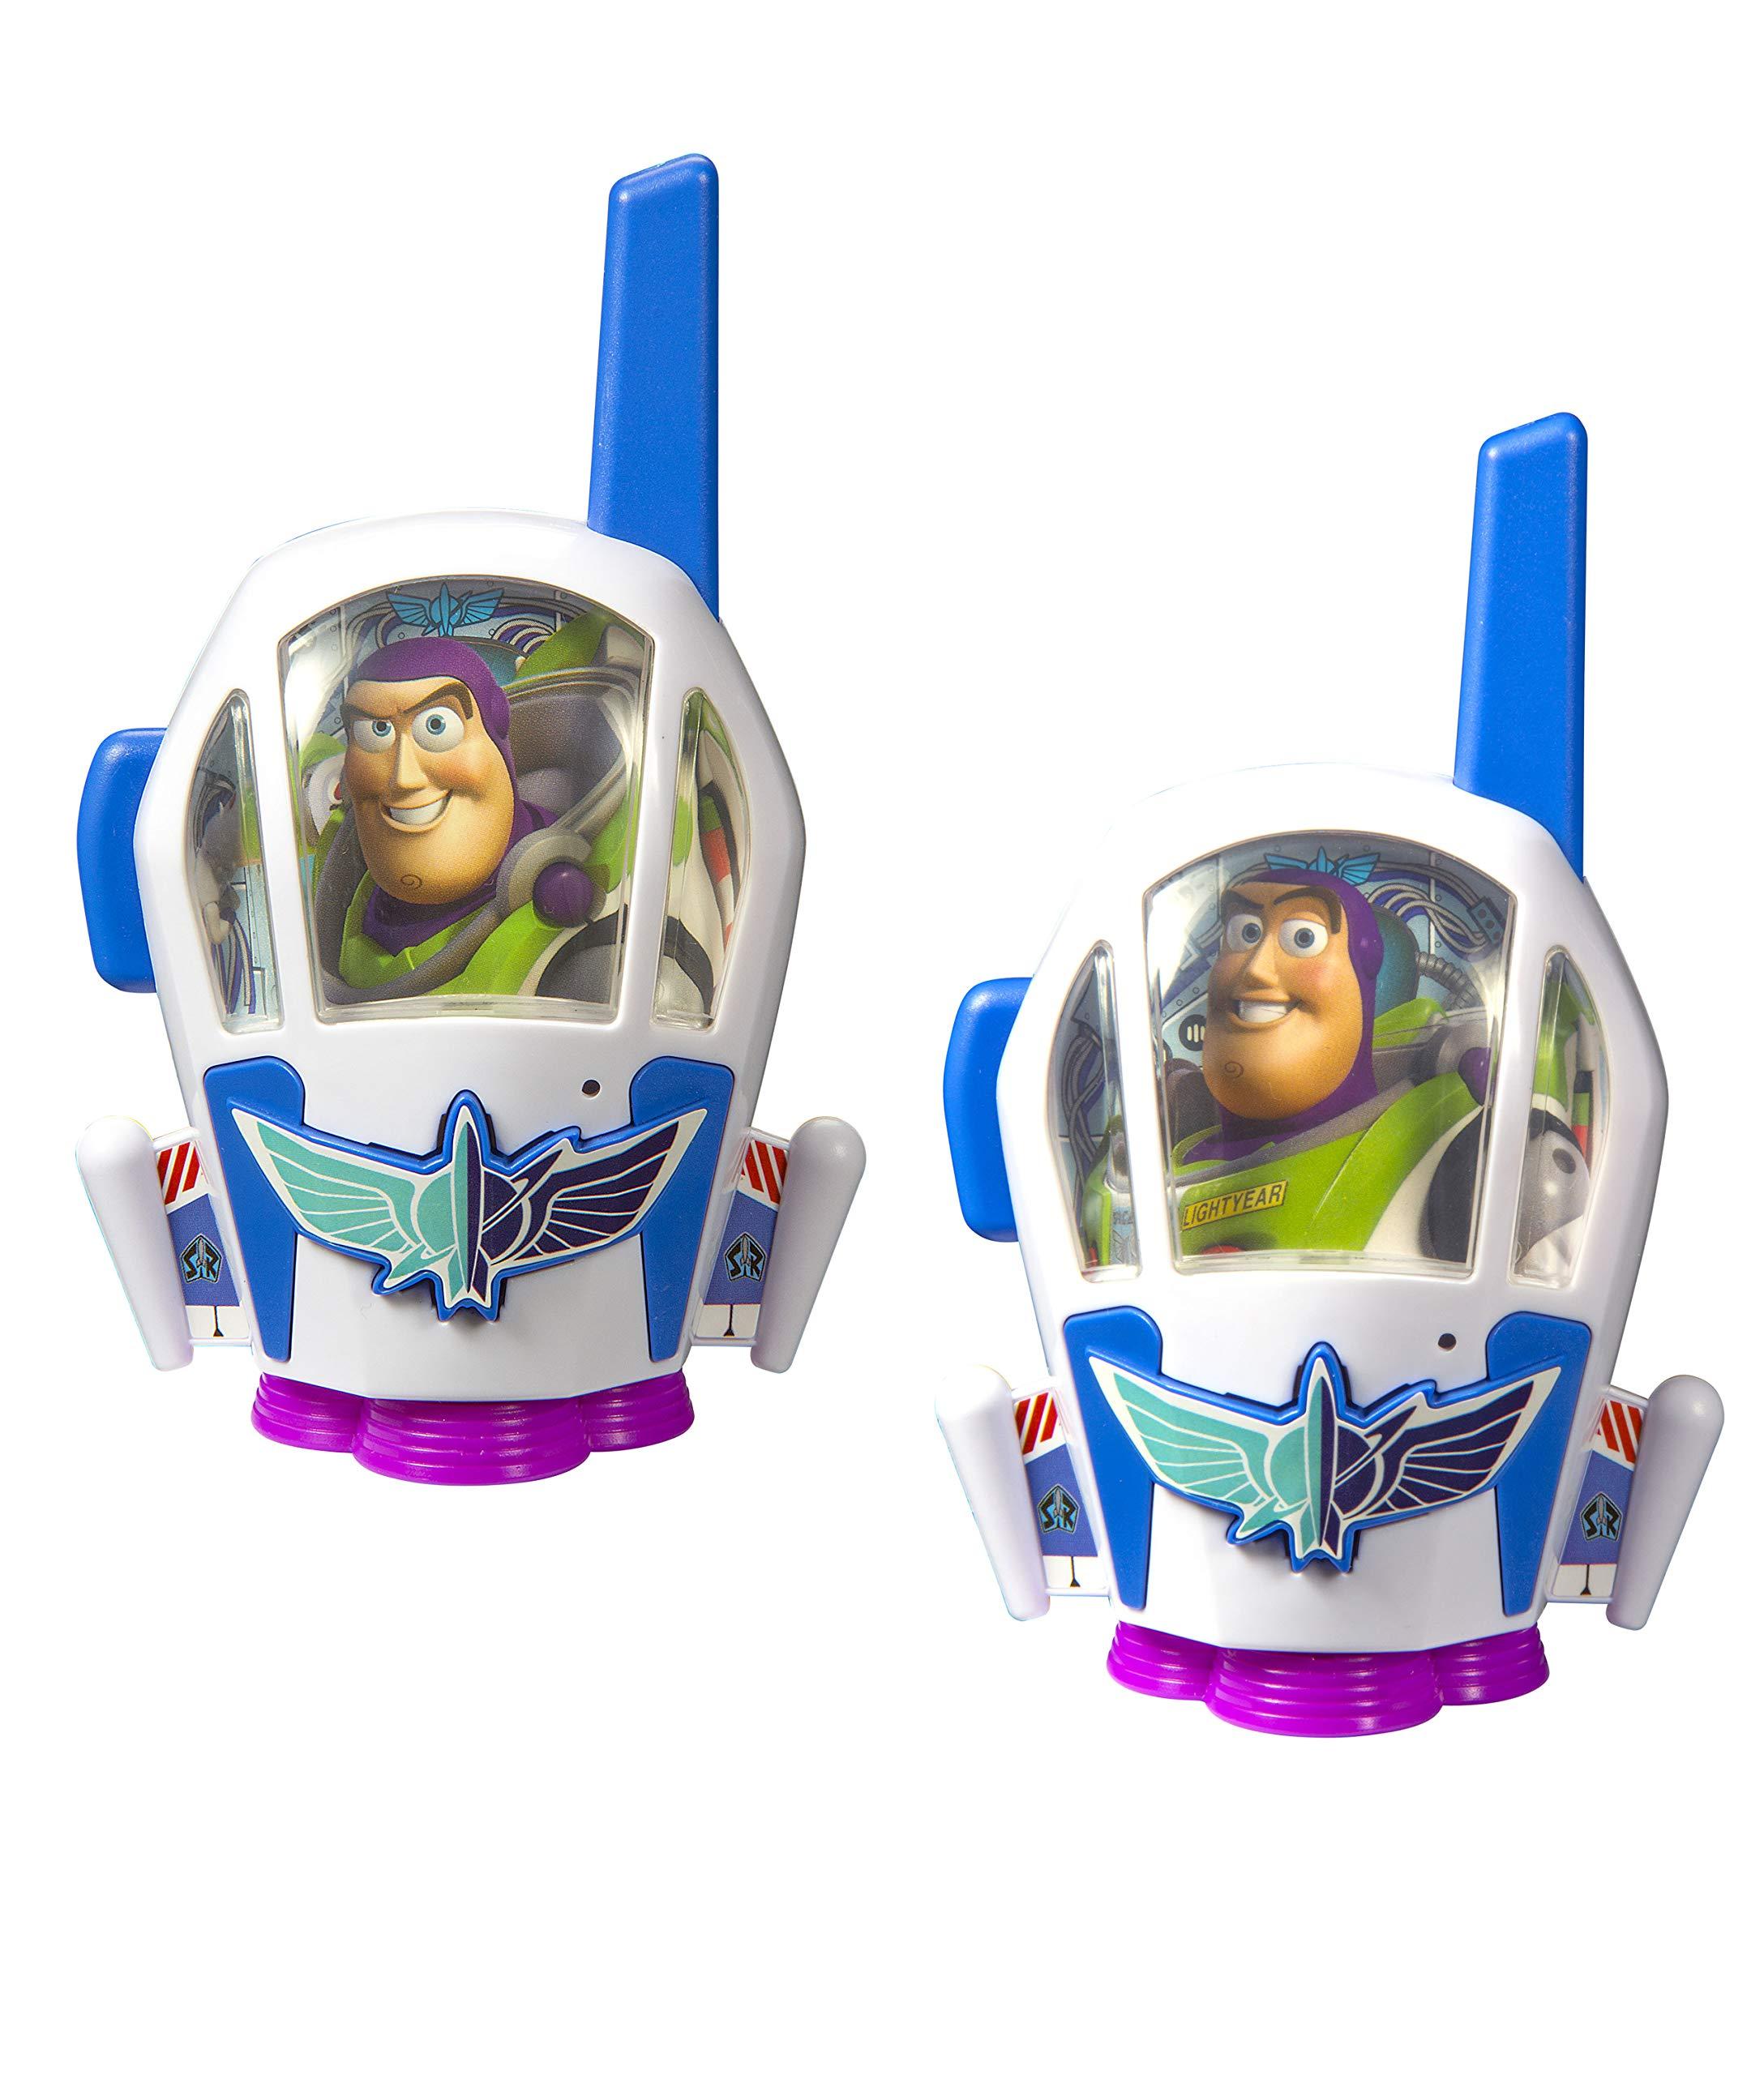 Toy Story 4 Buzz Lightyear Kids Walkie Talkies for Kids Static Free Extended Range Kid Friendly Easy to Use 2 Way Radio Toy Handheld Walkie Talkies Team Work Play Indoors or Outdoors by eKids (Image #1)